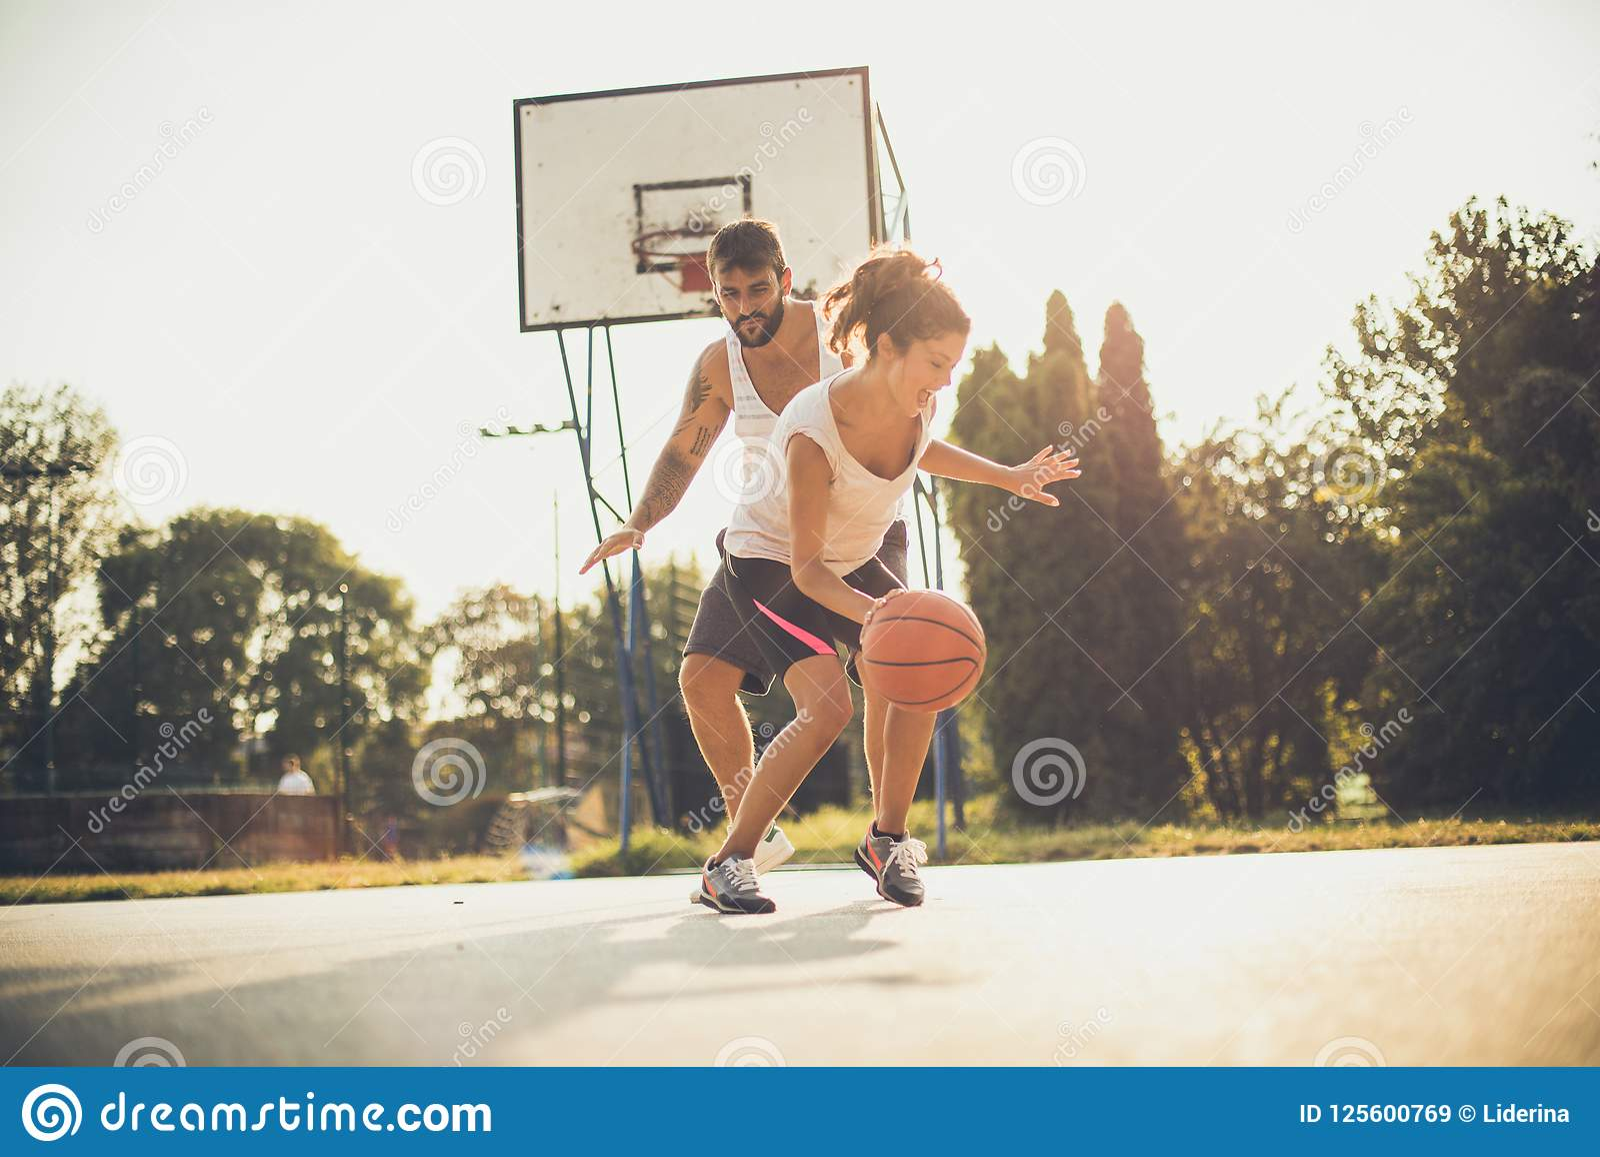 Young Couple Playing Basketball Stock Image Image Of Young